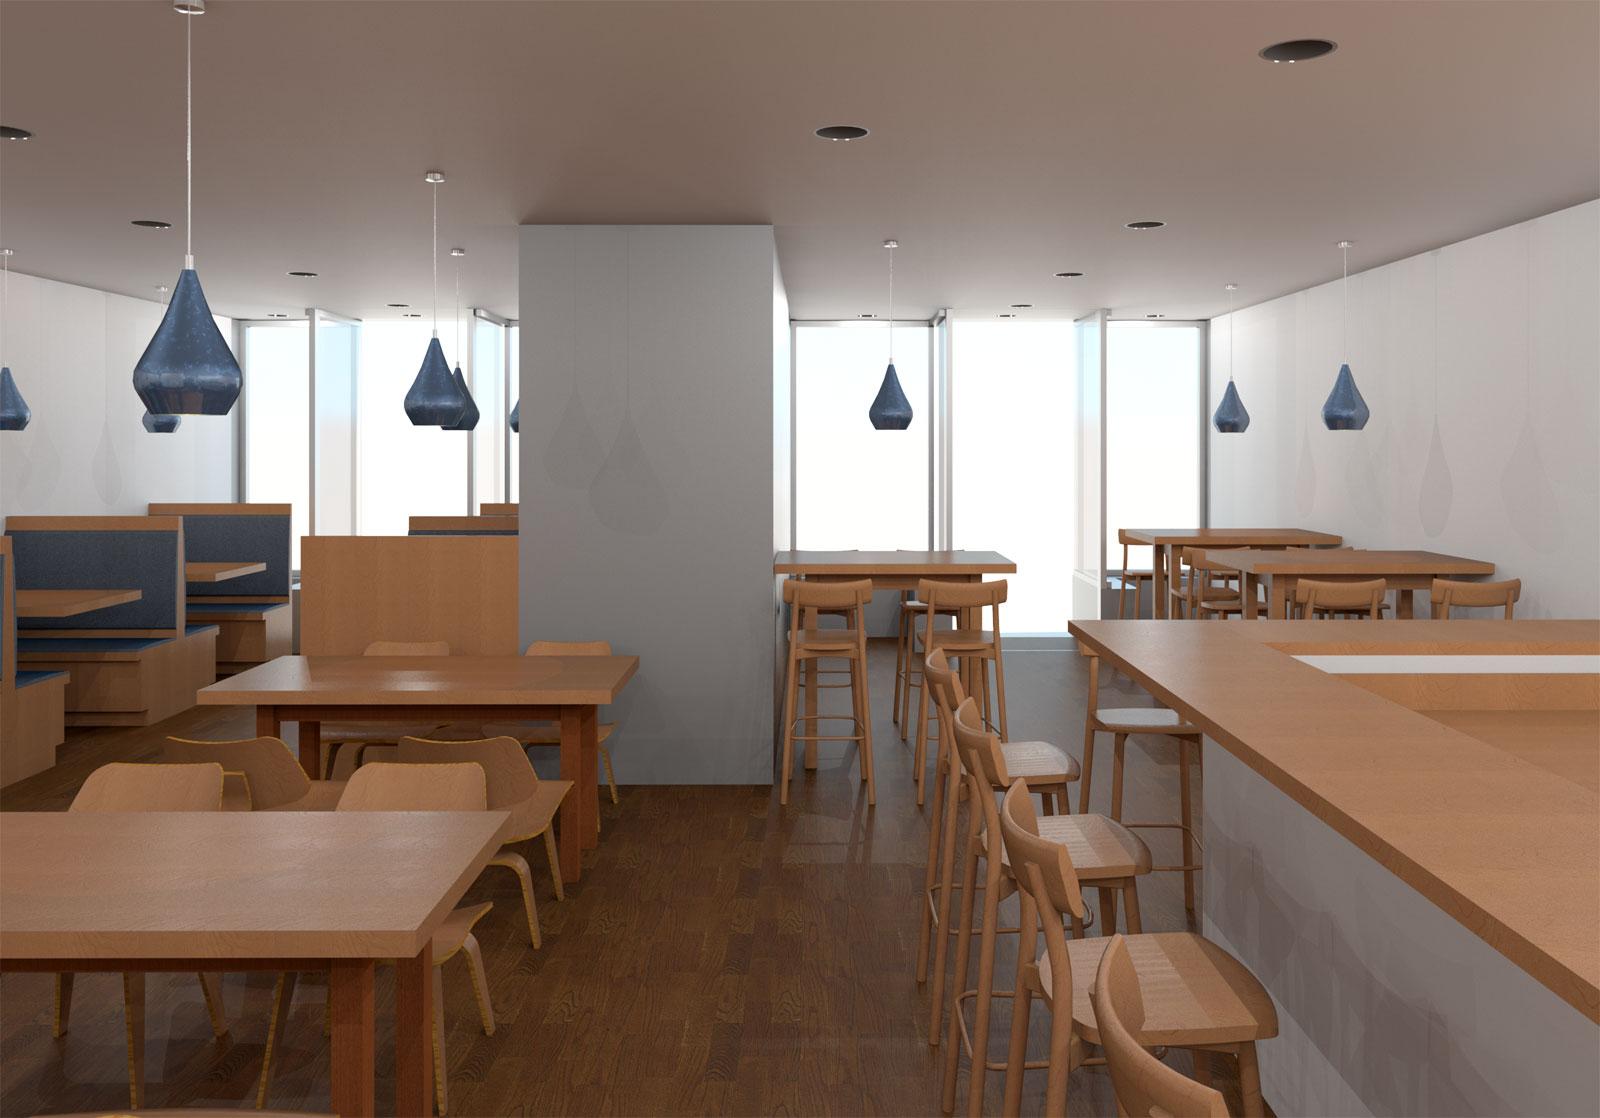 5x30 Restaurant Final Render